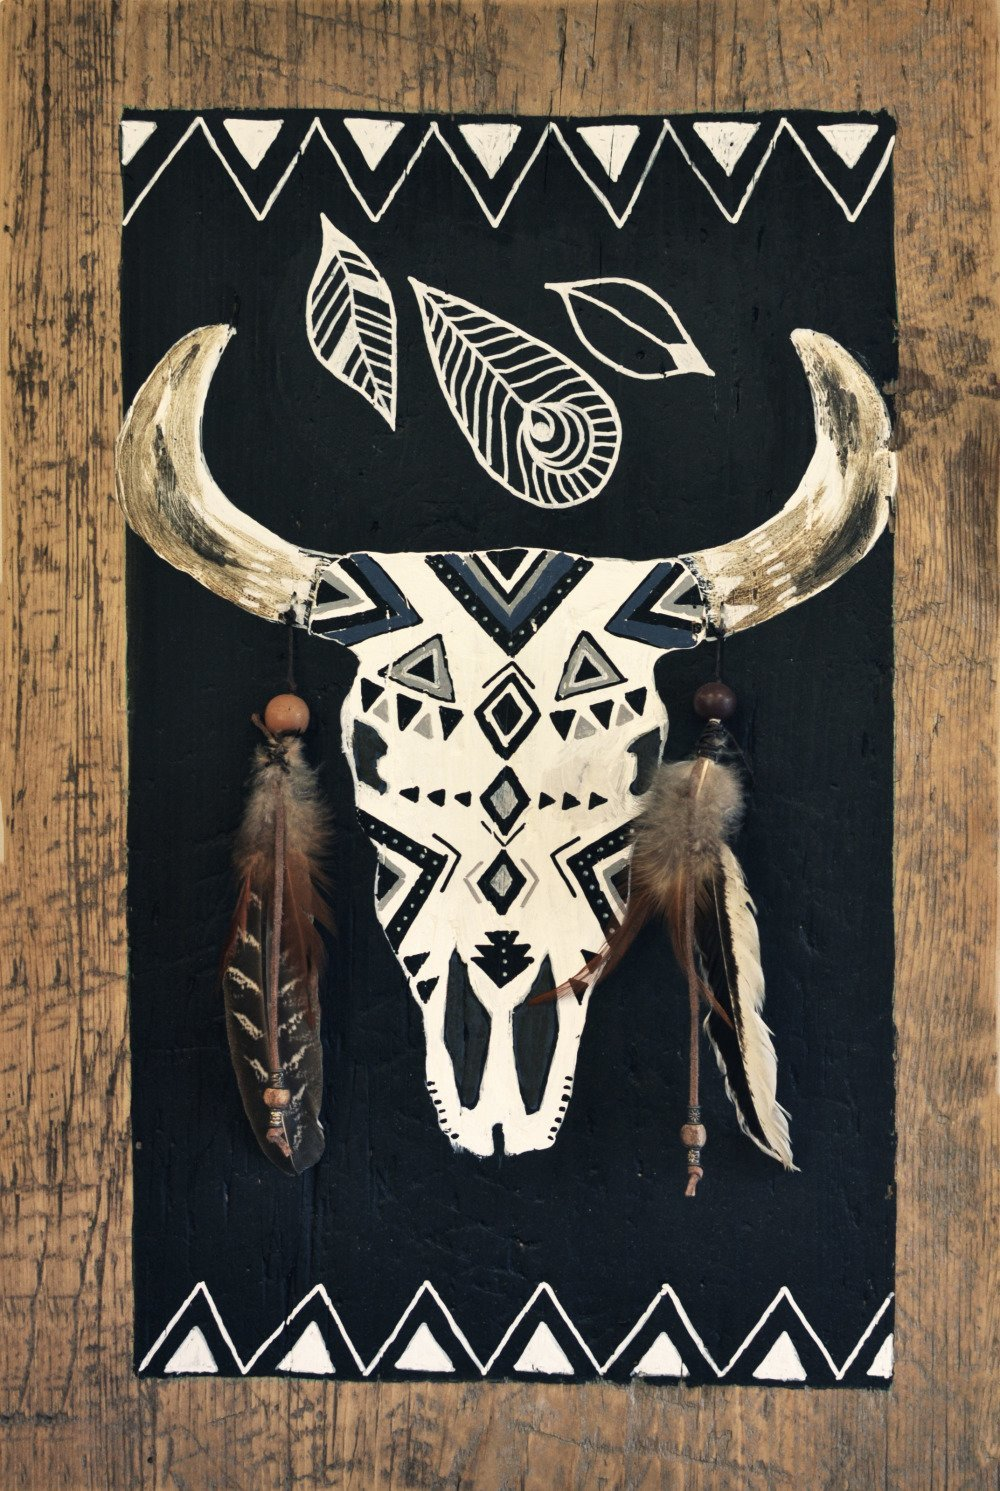 Tableau cow skull